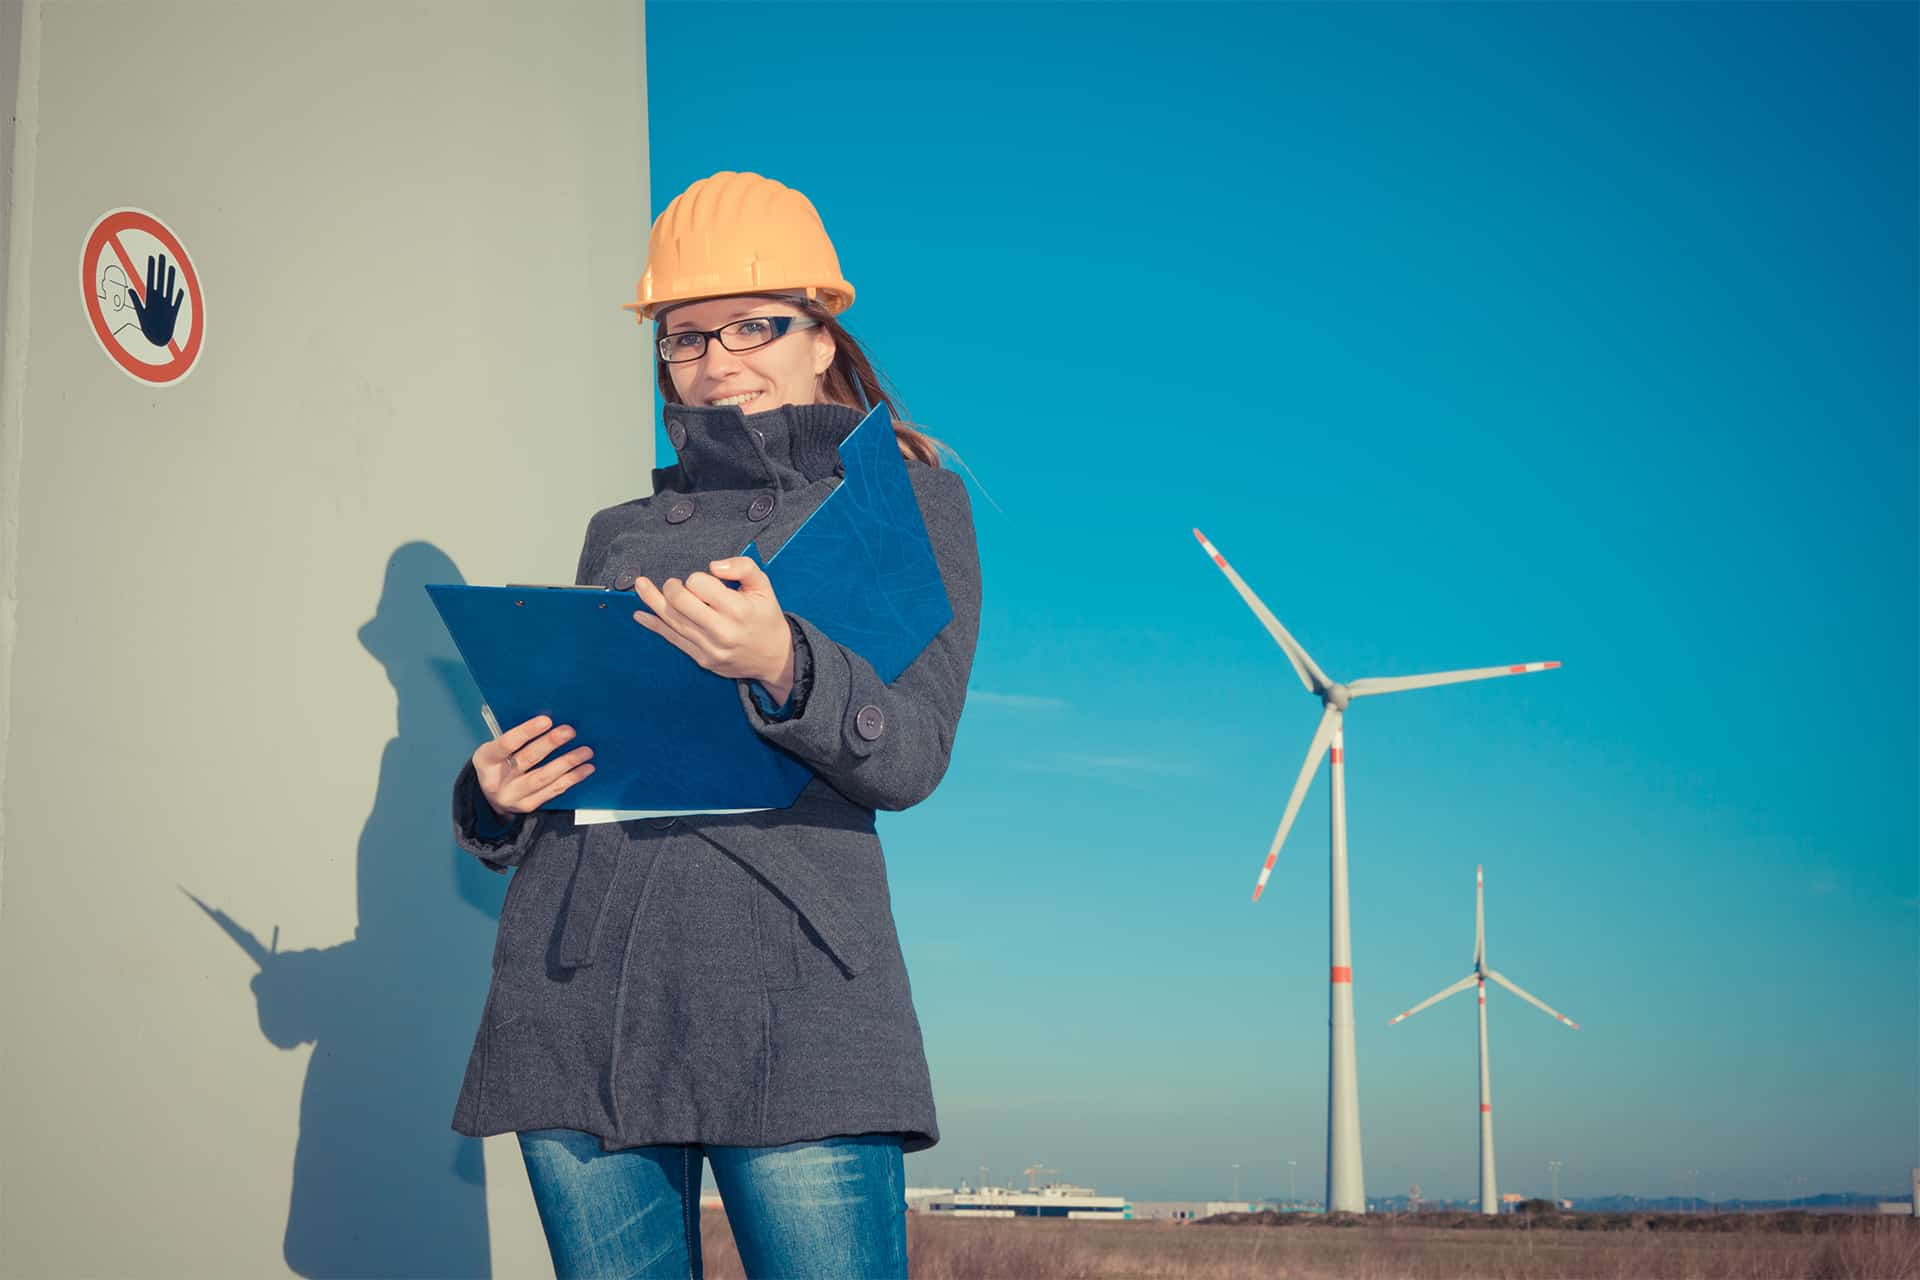 MConcept - Ihre Energiemanager